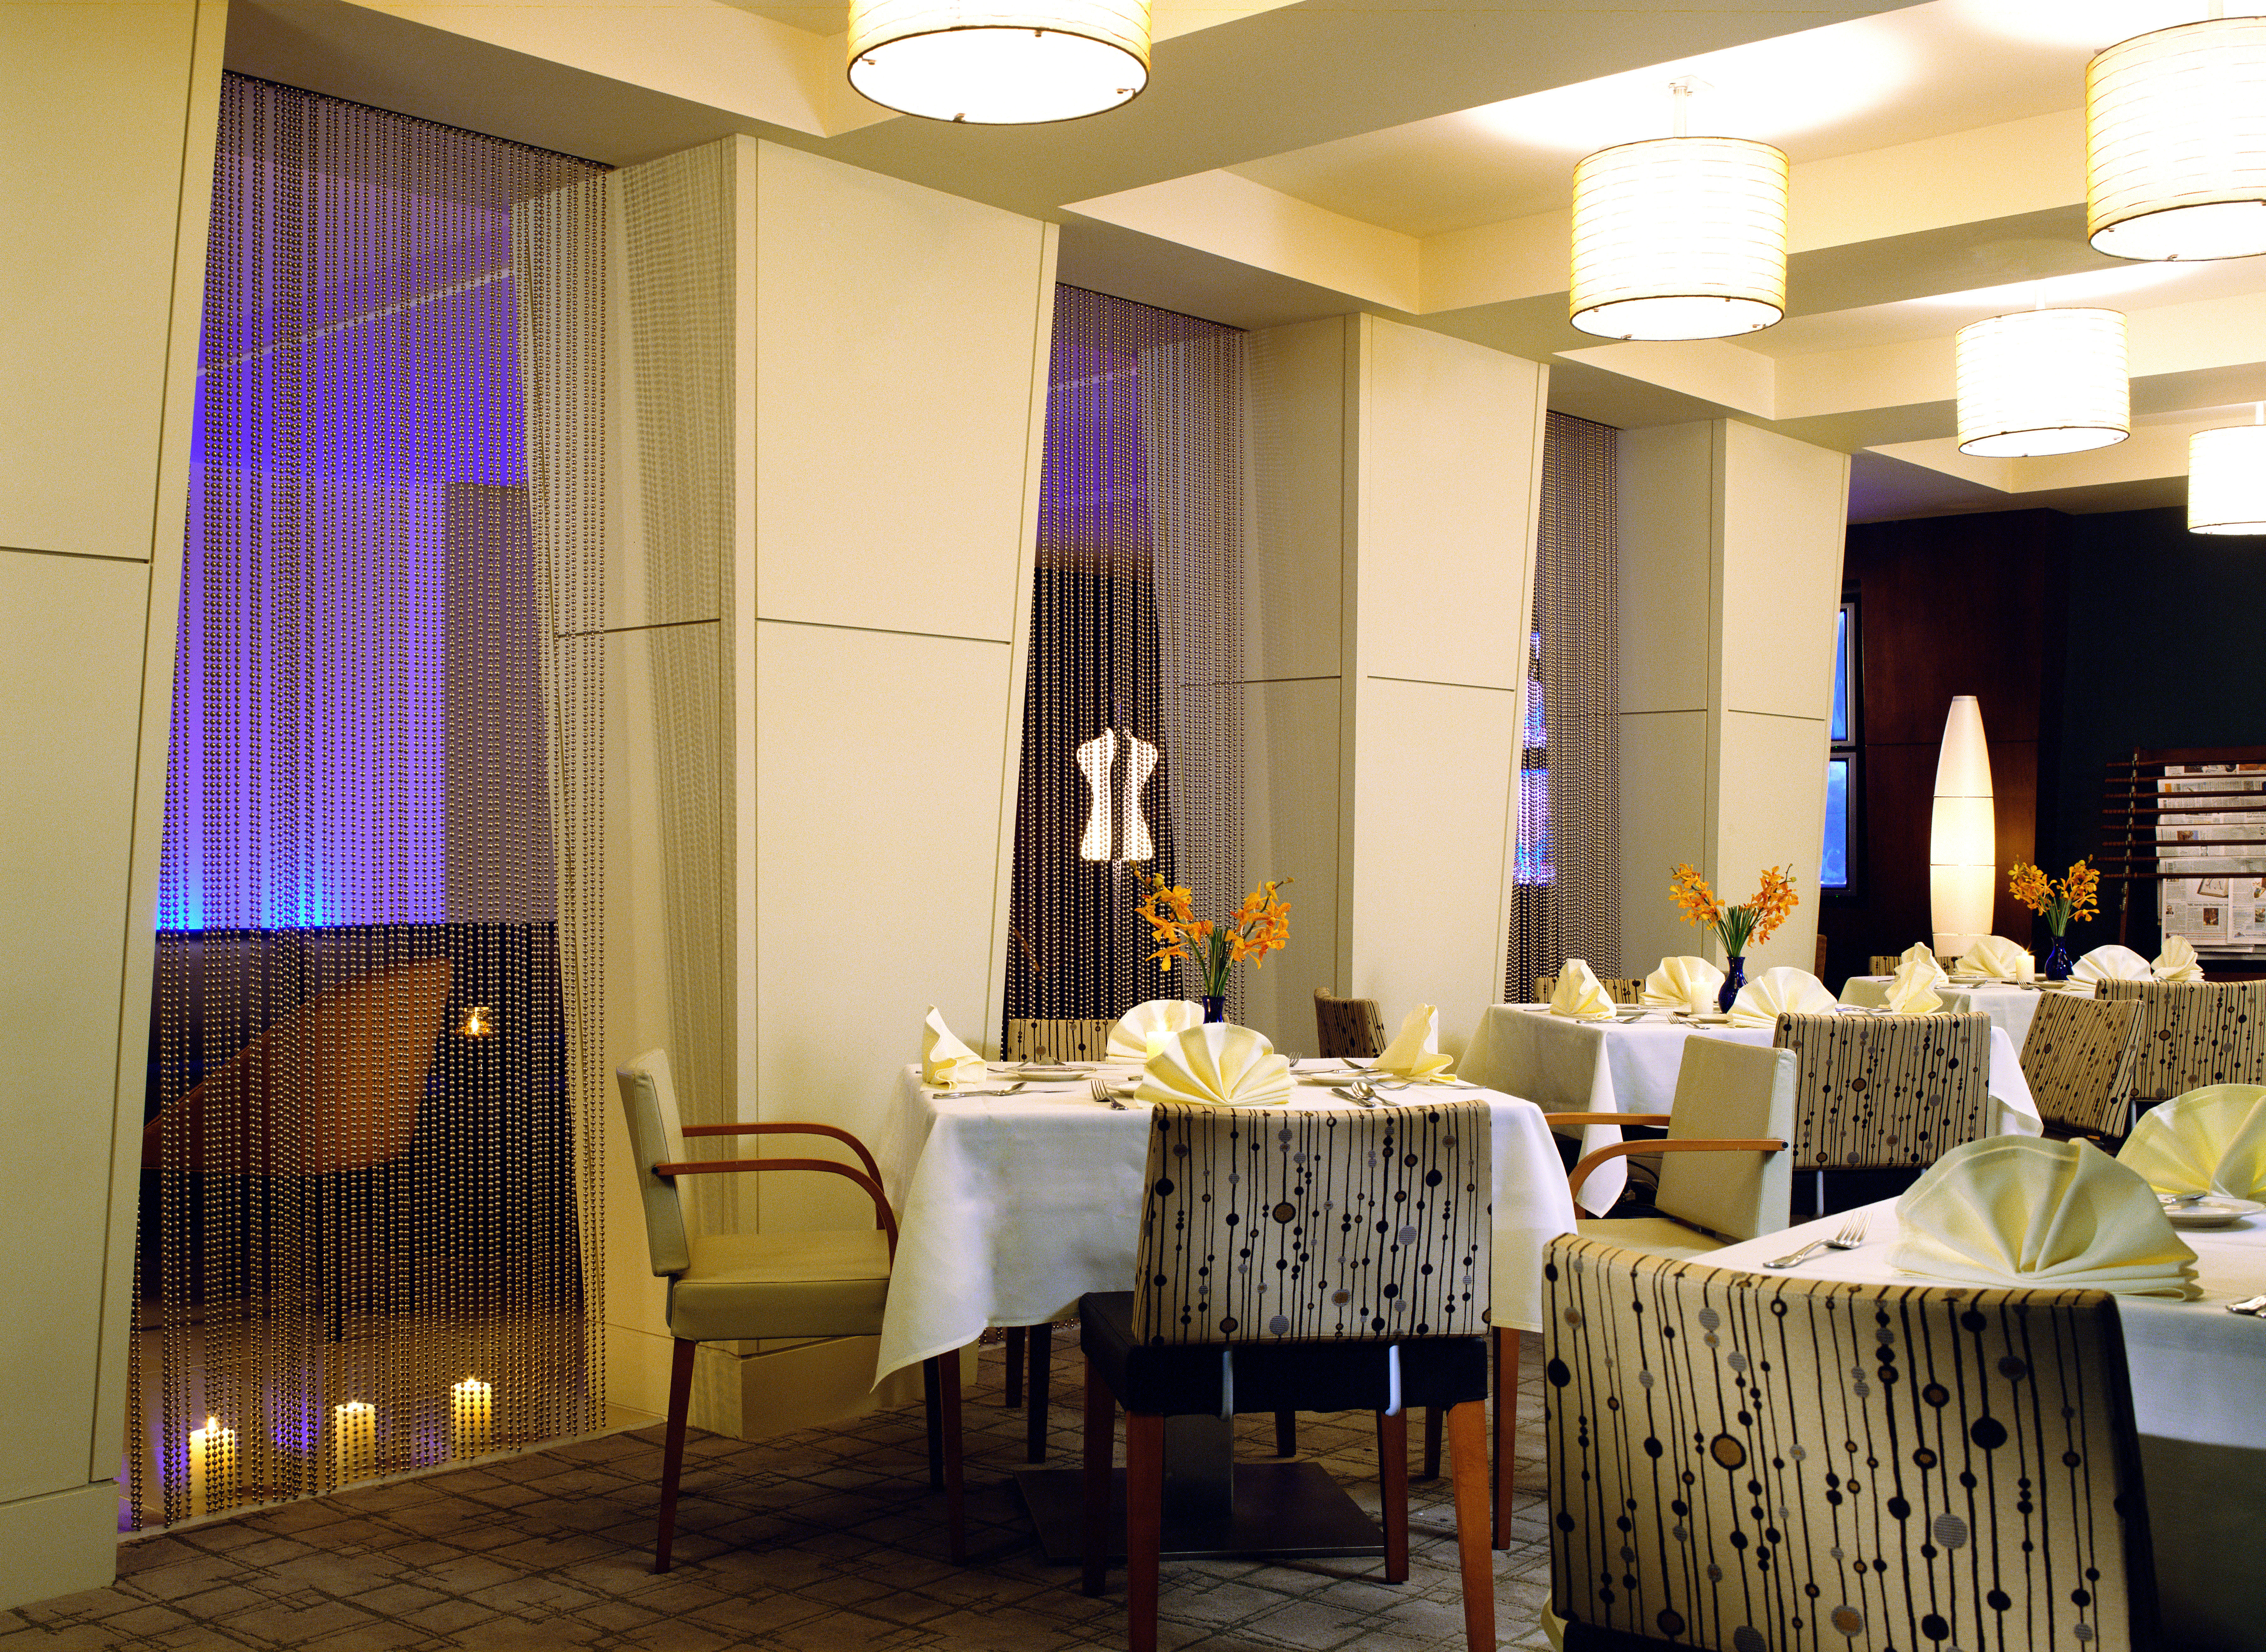 Bar Dining Drink Eat Luxury function hall restaurant ballroom banquet